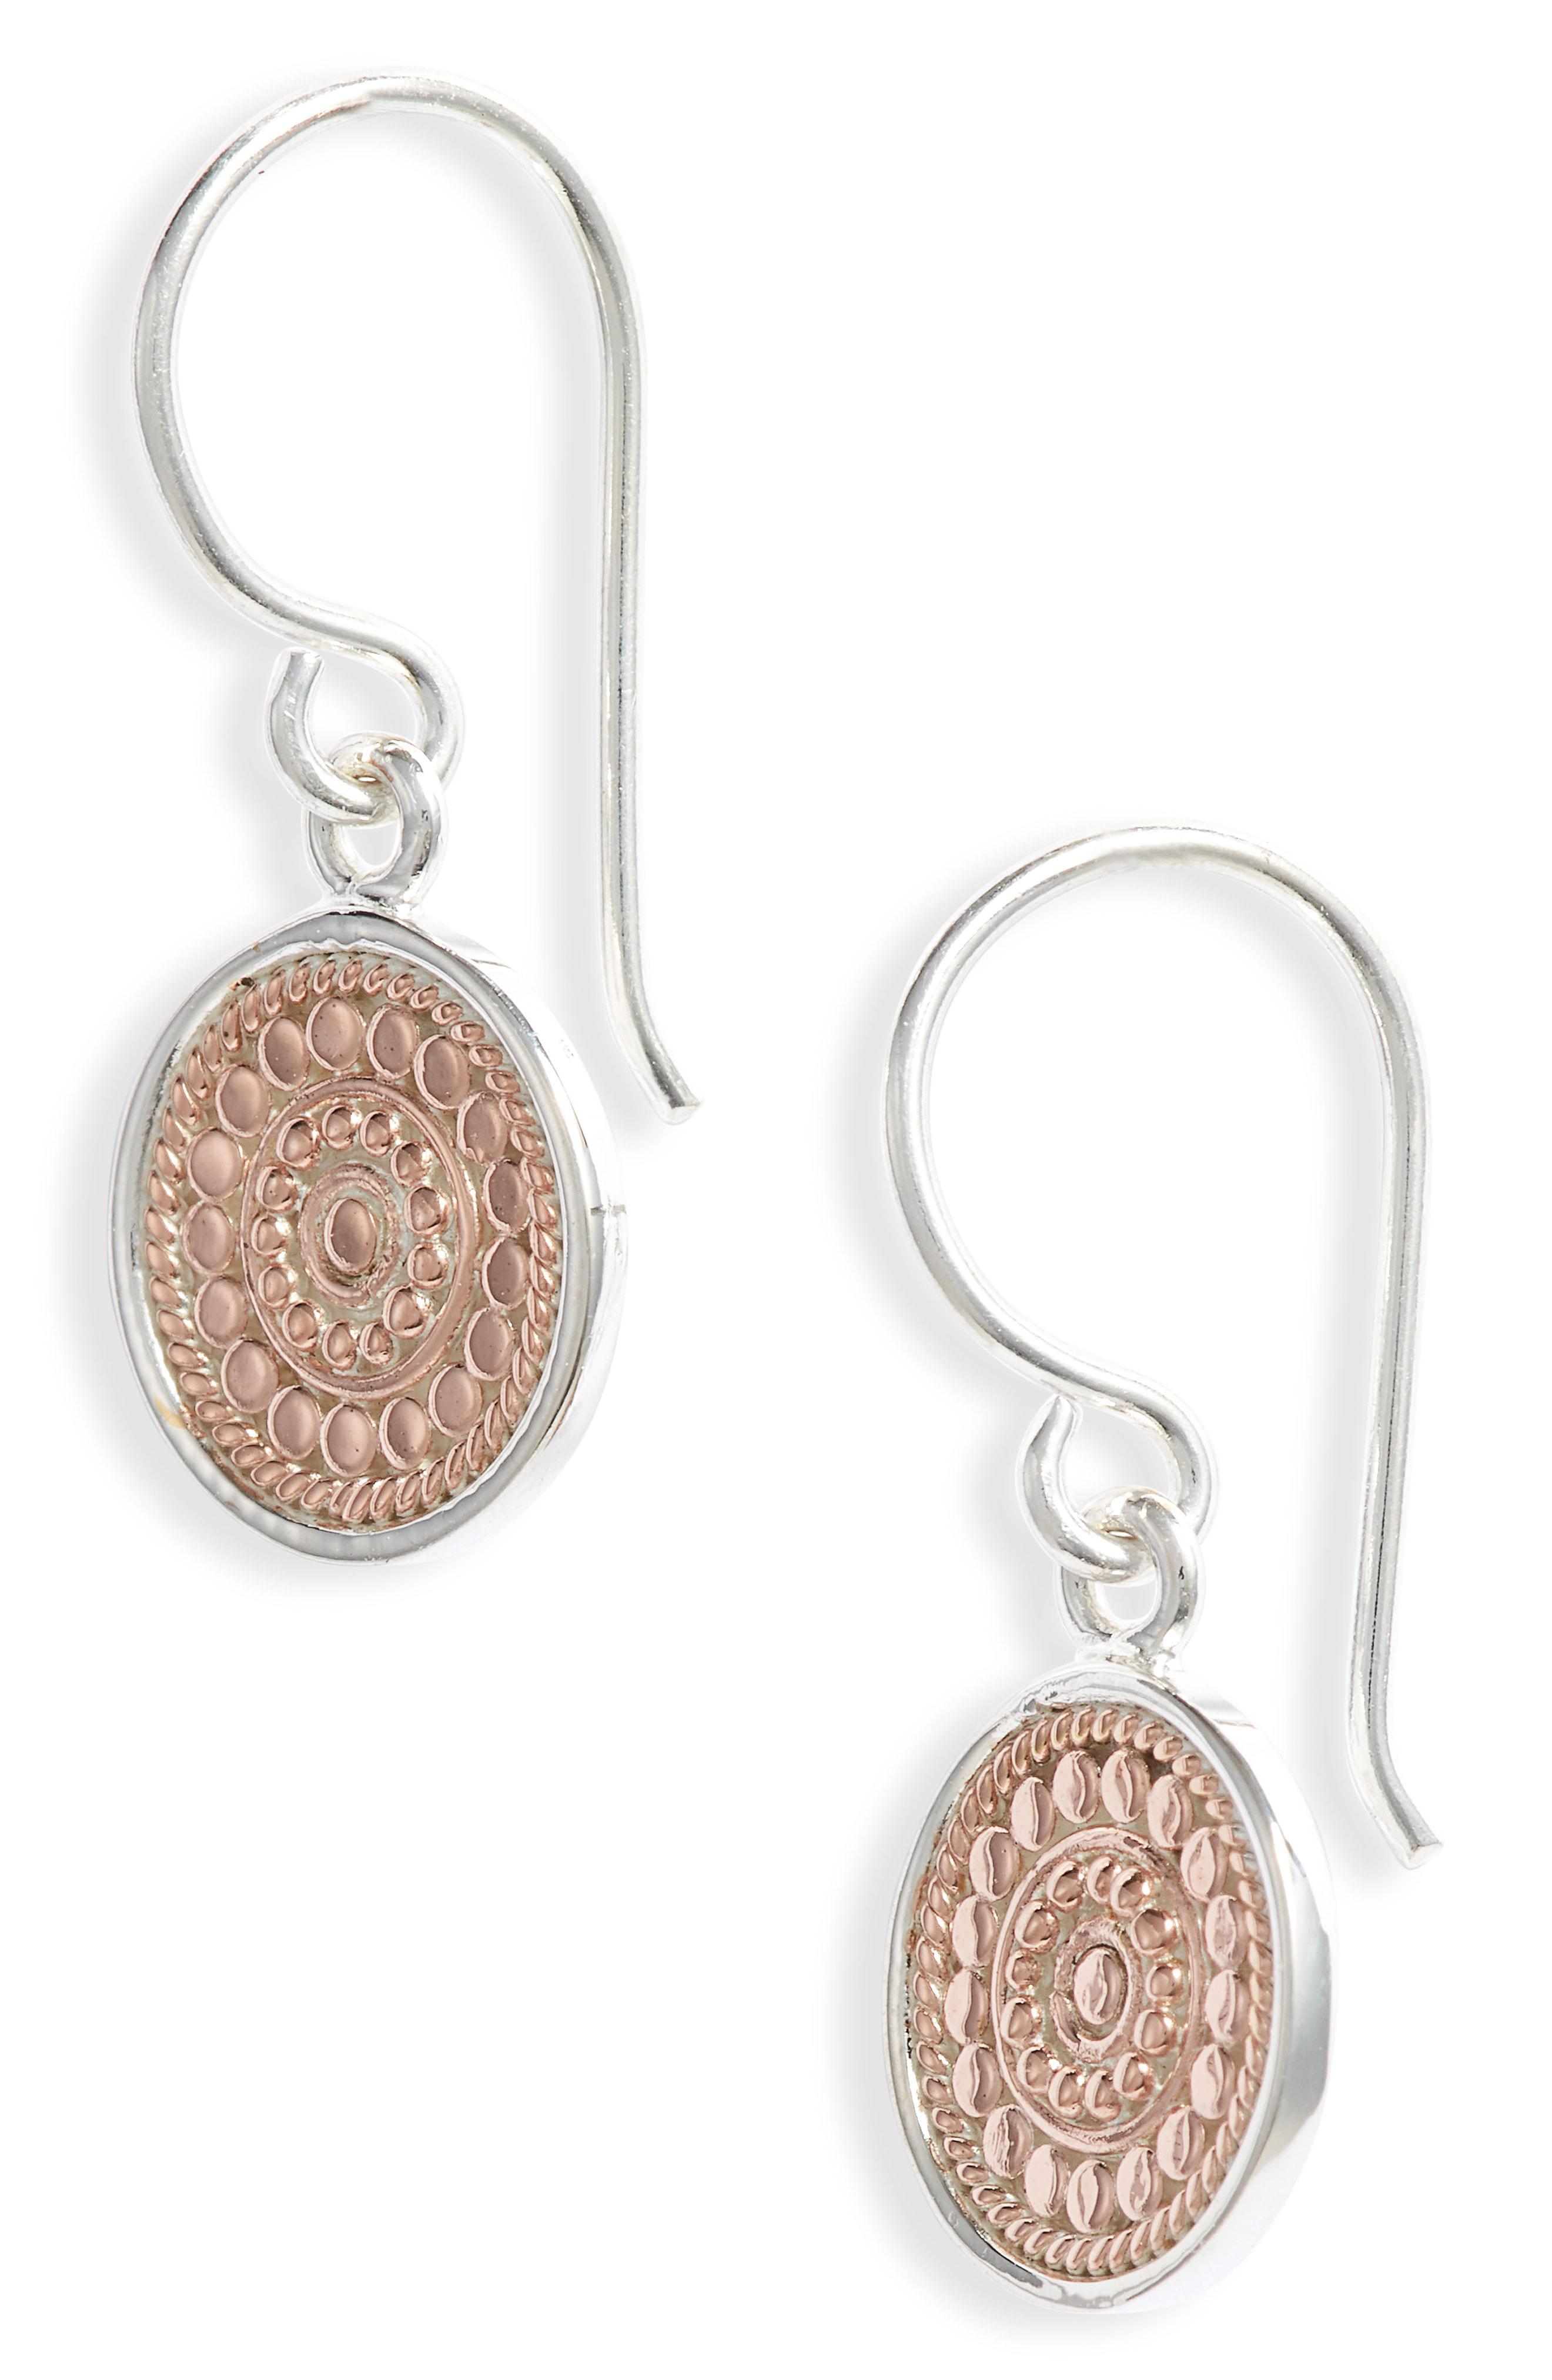 9db566fe3 Lyst - Anna Beck Circle Drop Earrings in Metallic